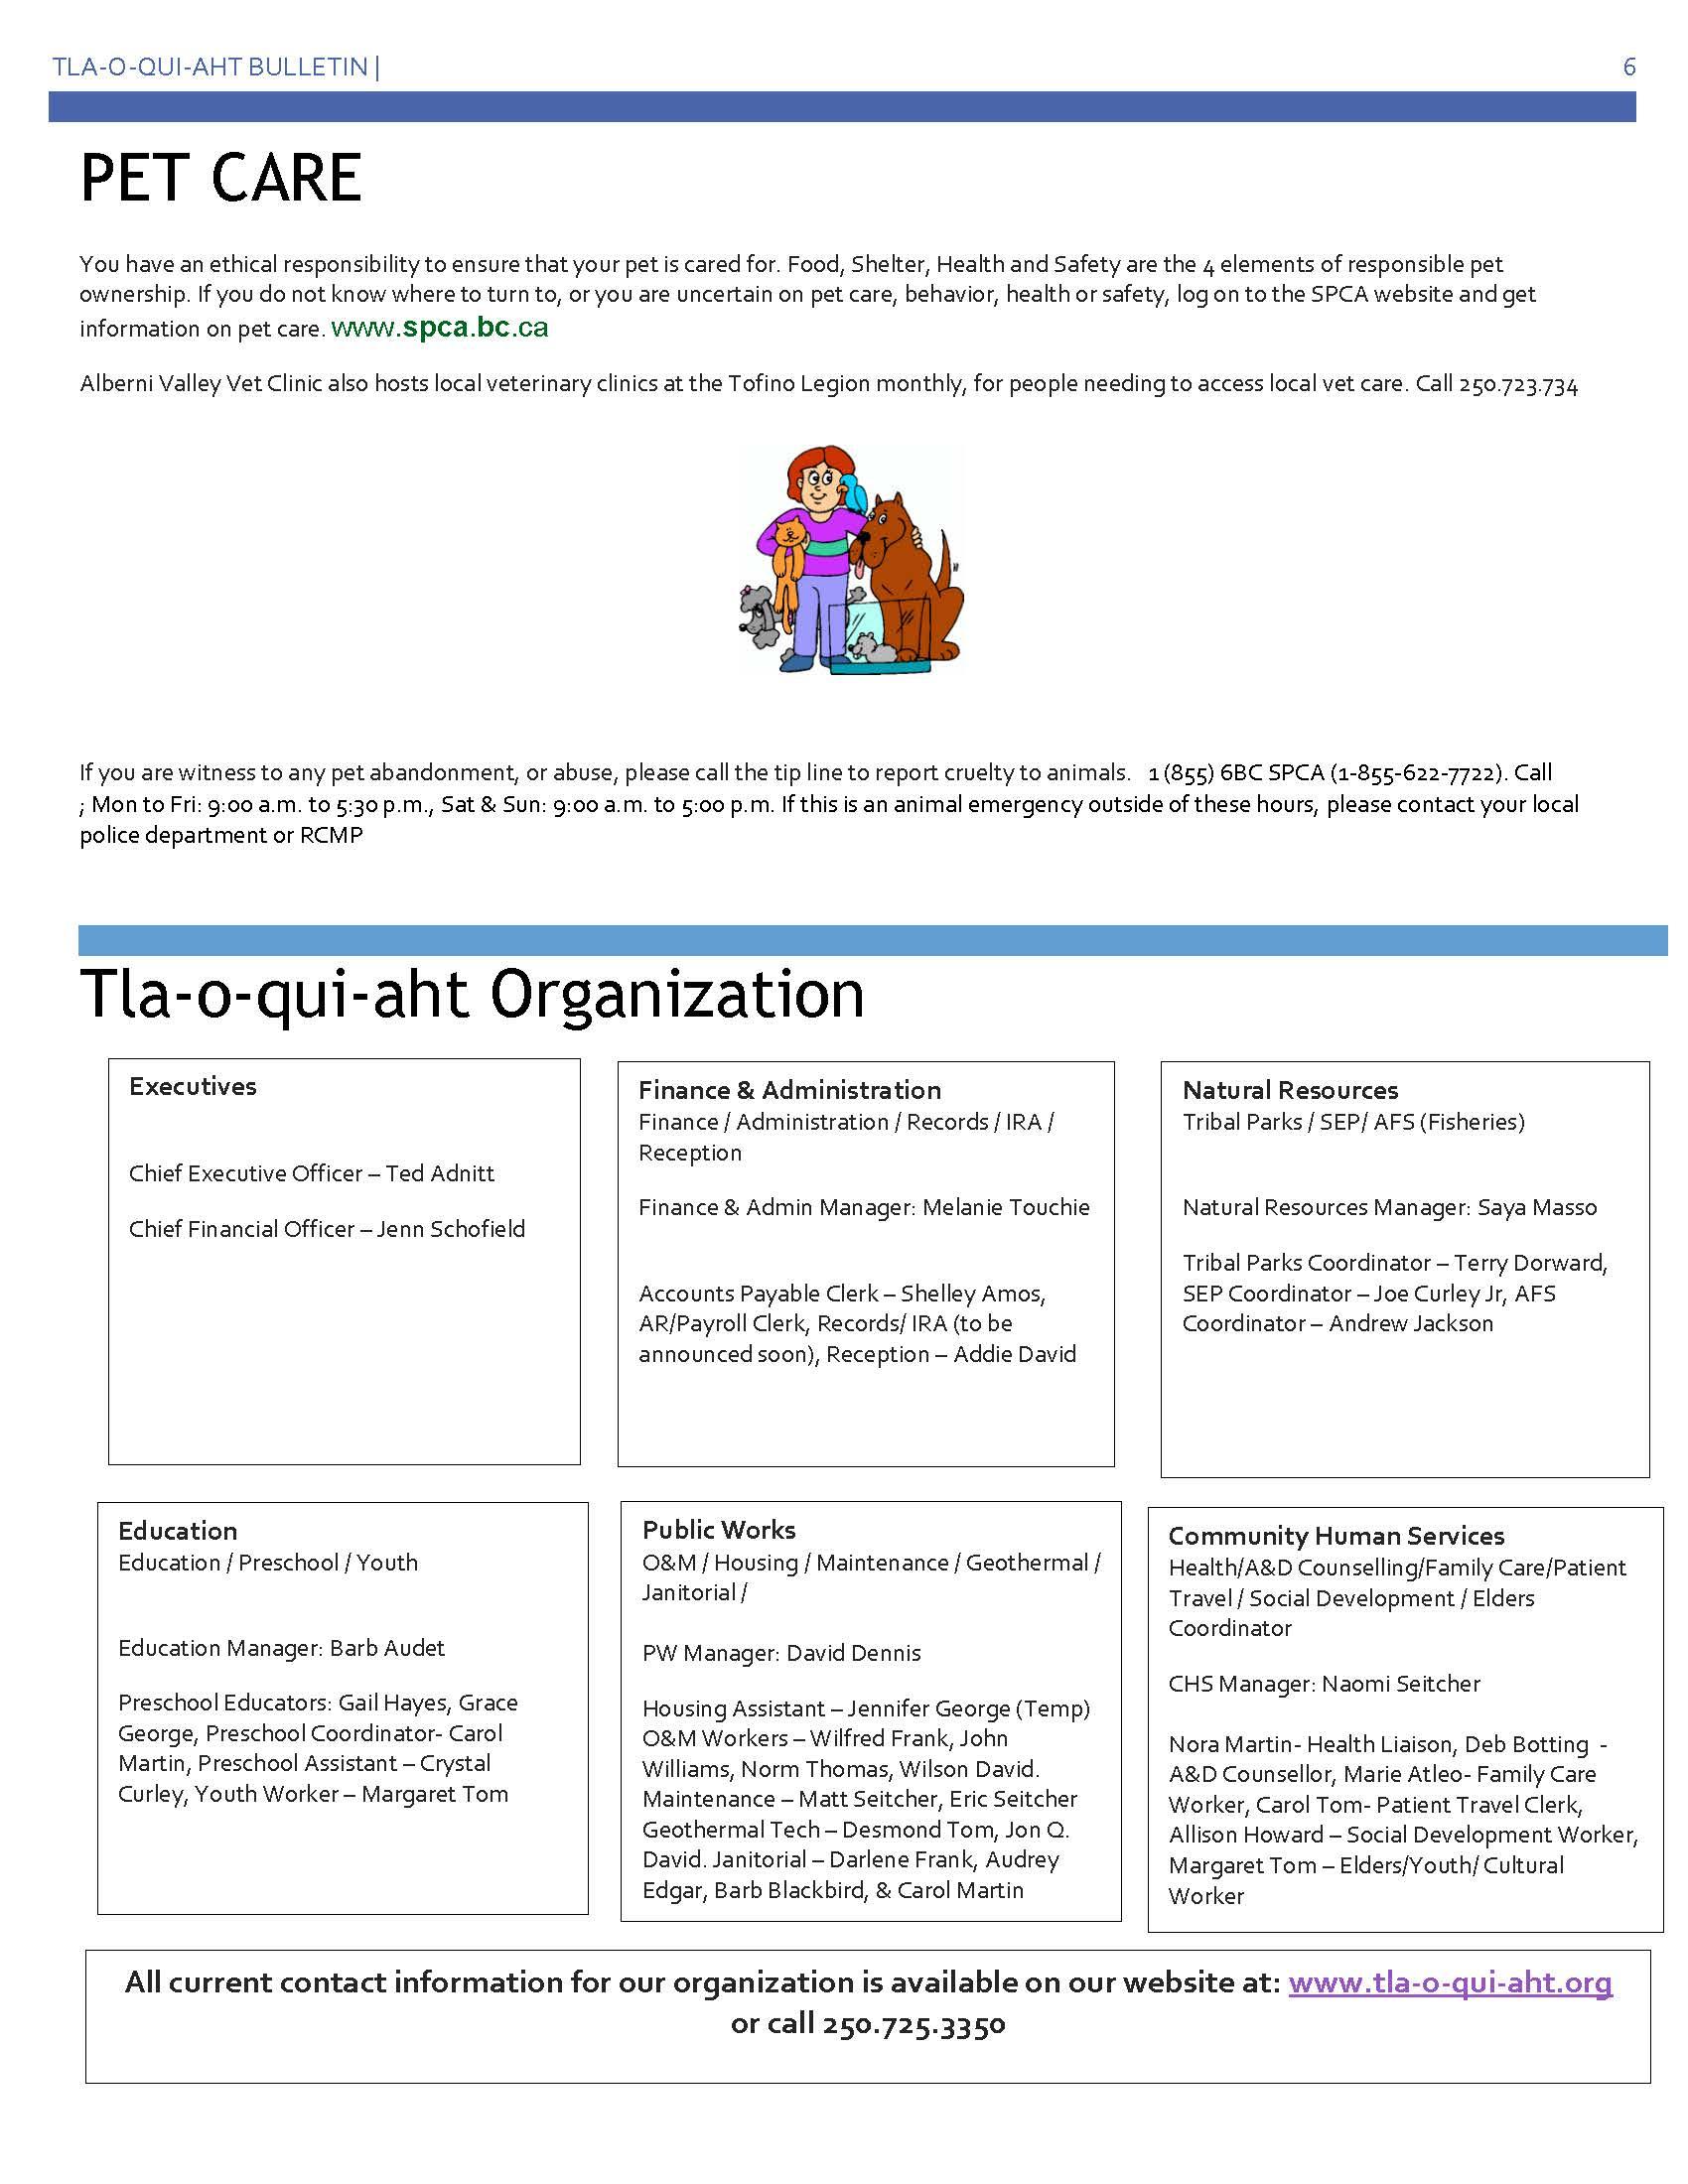 TFN Bulletin Jan 31-2016_Page_6.jpg